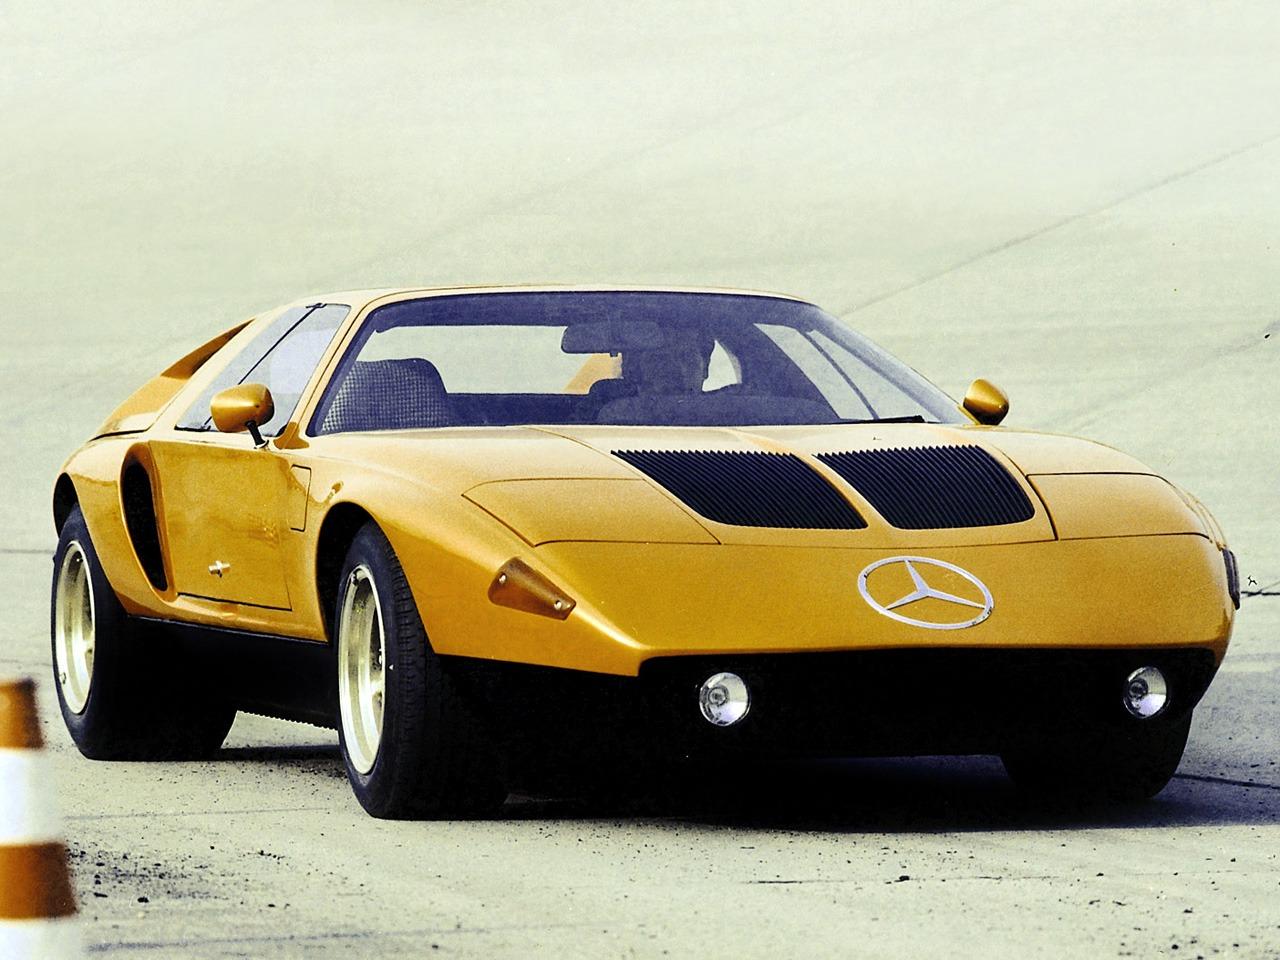 mercedes benz c111 ii d concept 1976 old concept cars. Black Bedroom Furniture Sets. Home Design Ideas